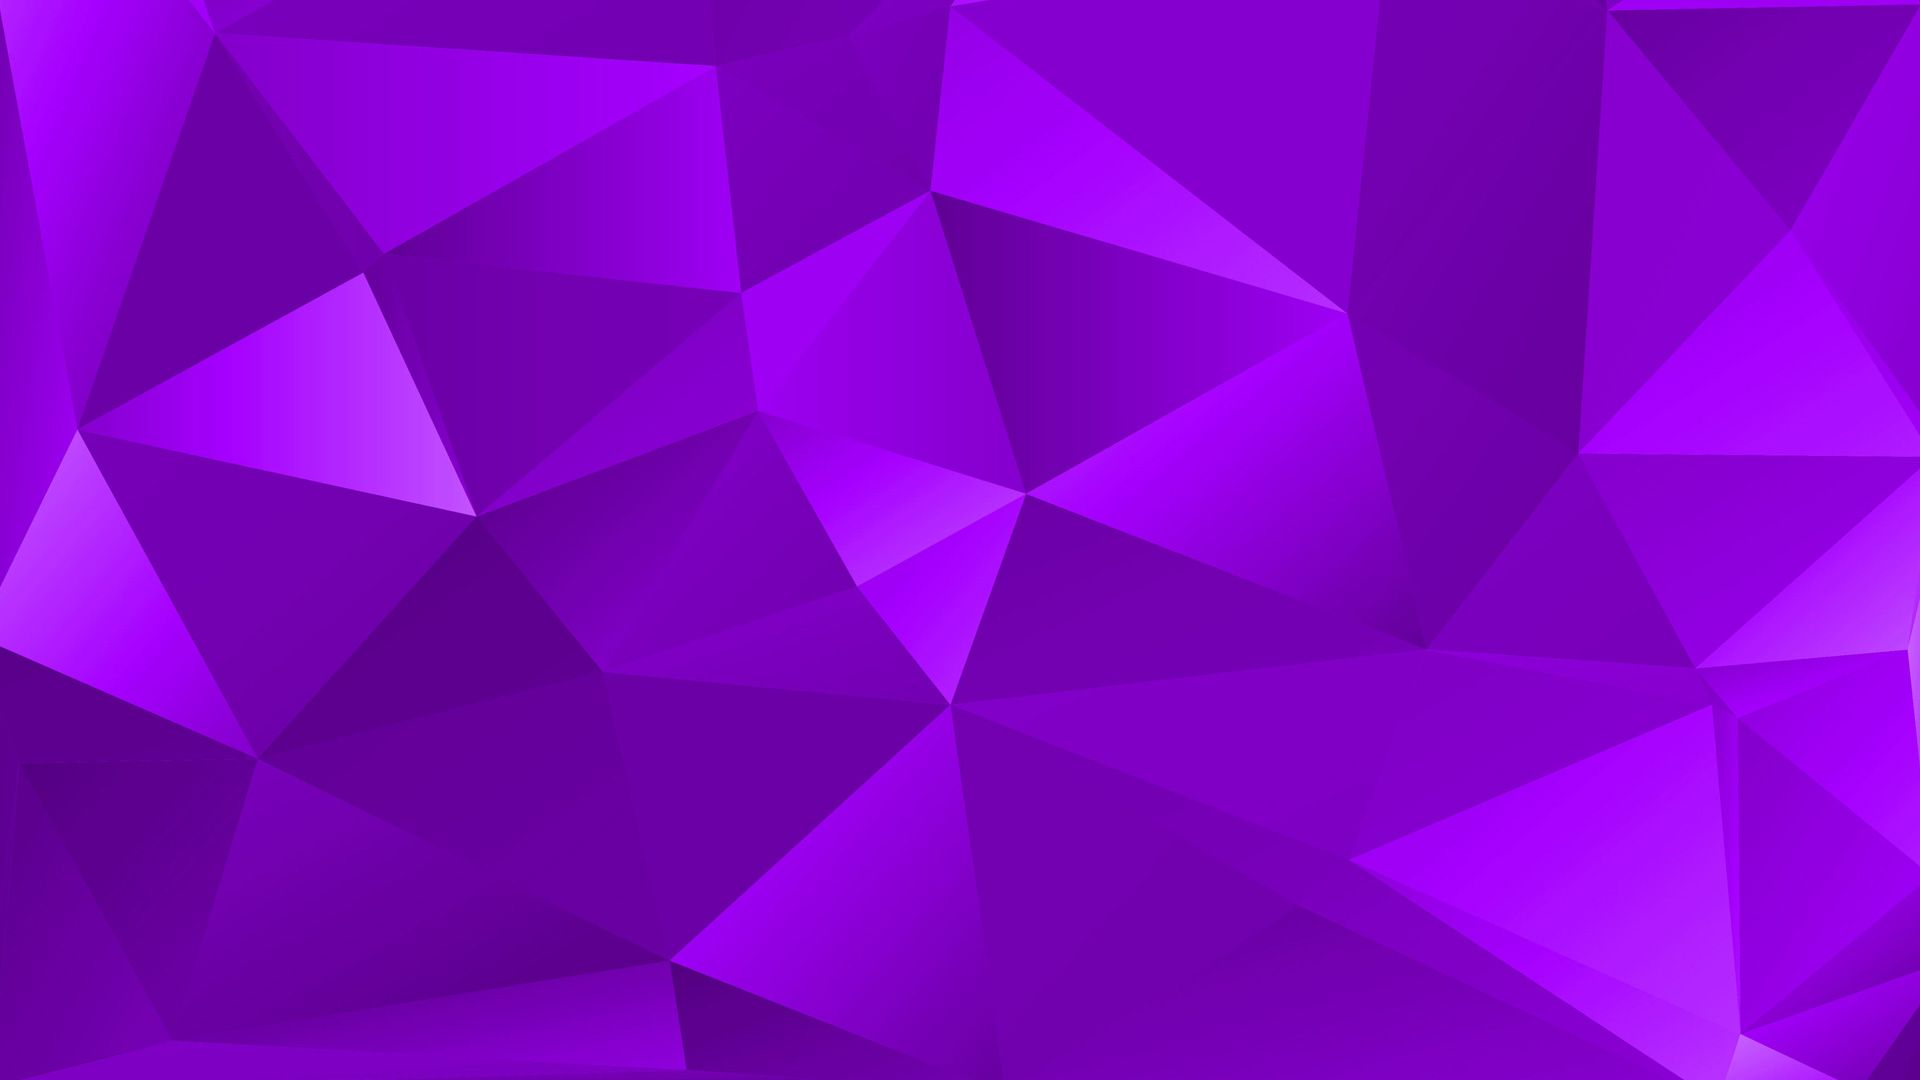 Purple And White good wallpaper